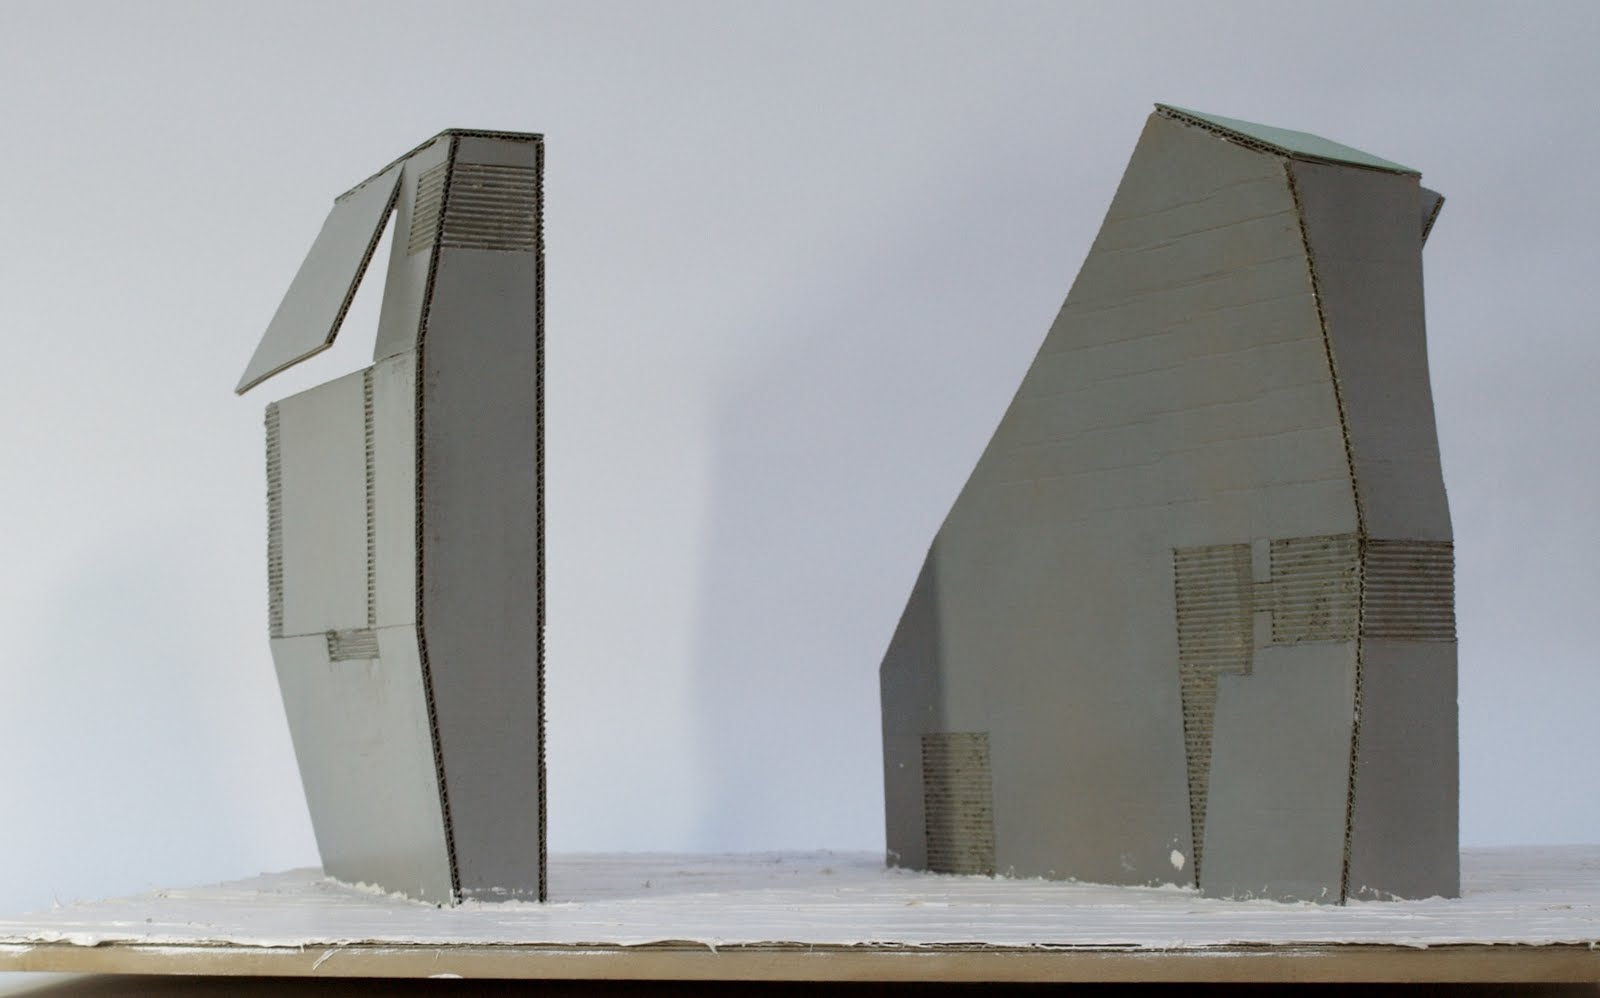 Twee gebouwen